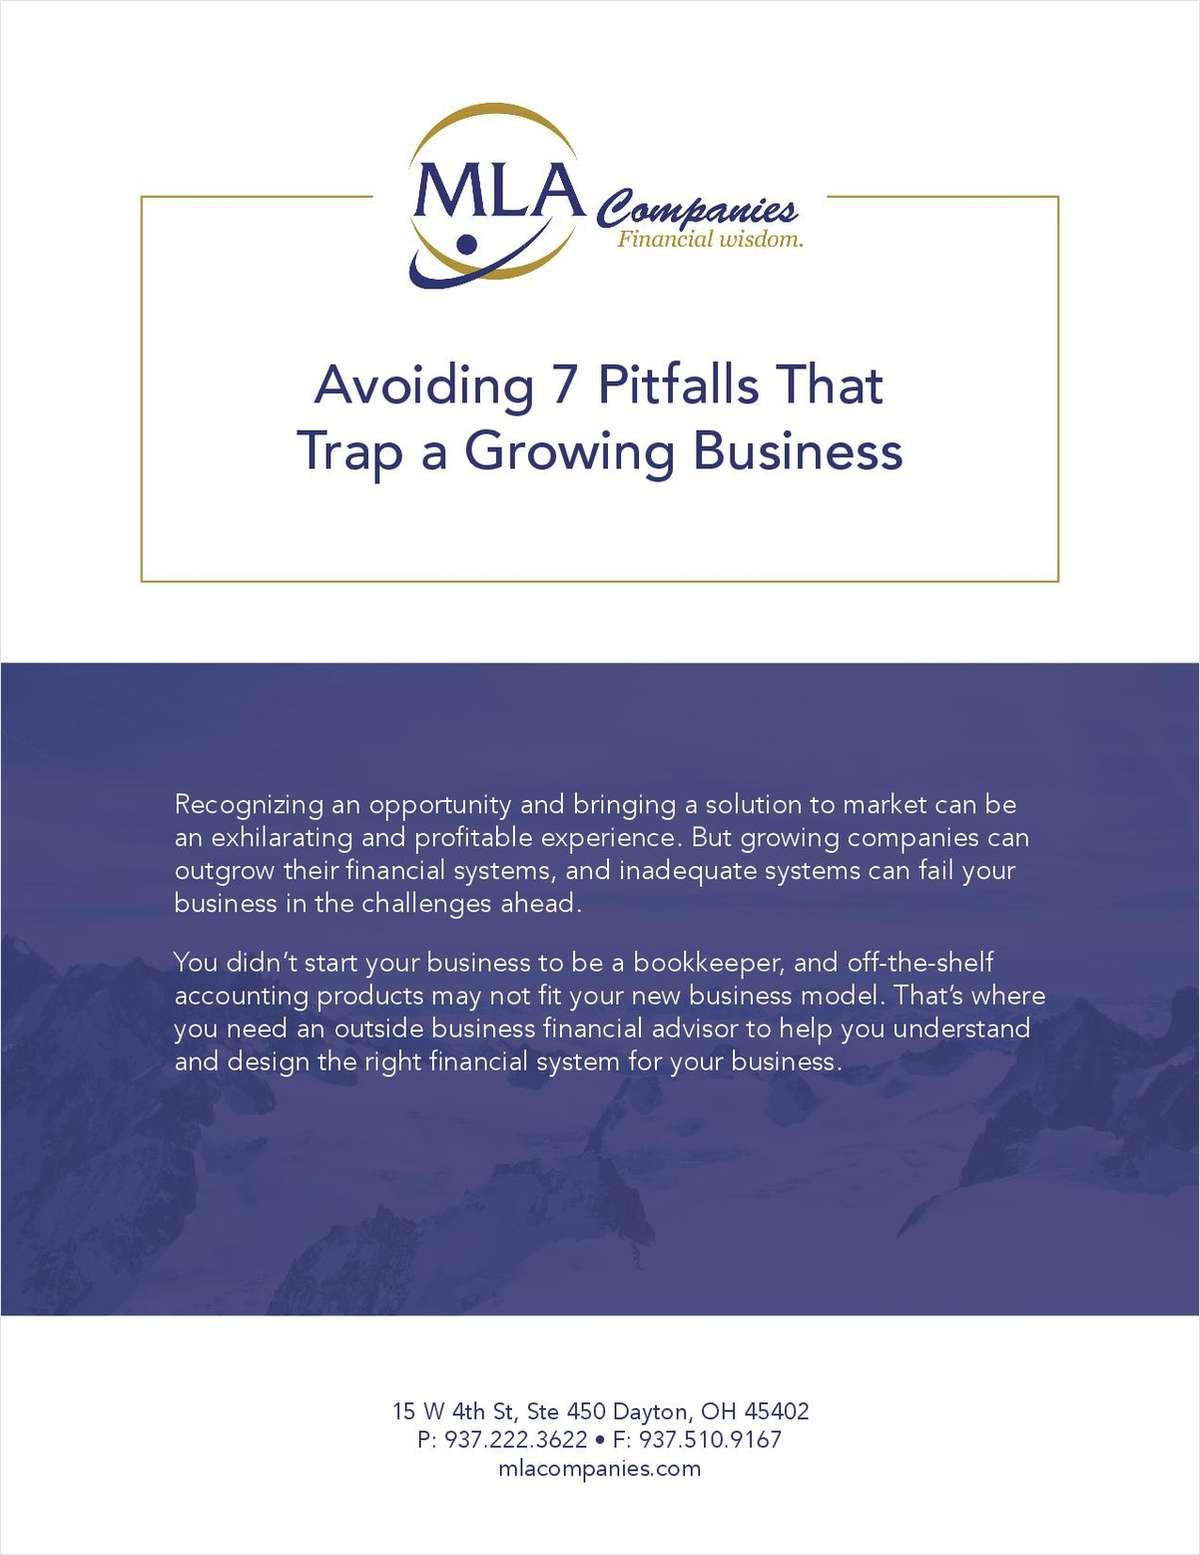 Avoiding 7 Pitfalls That Trap a Growing Business